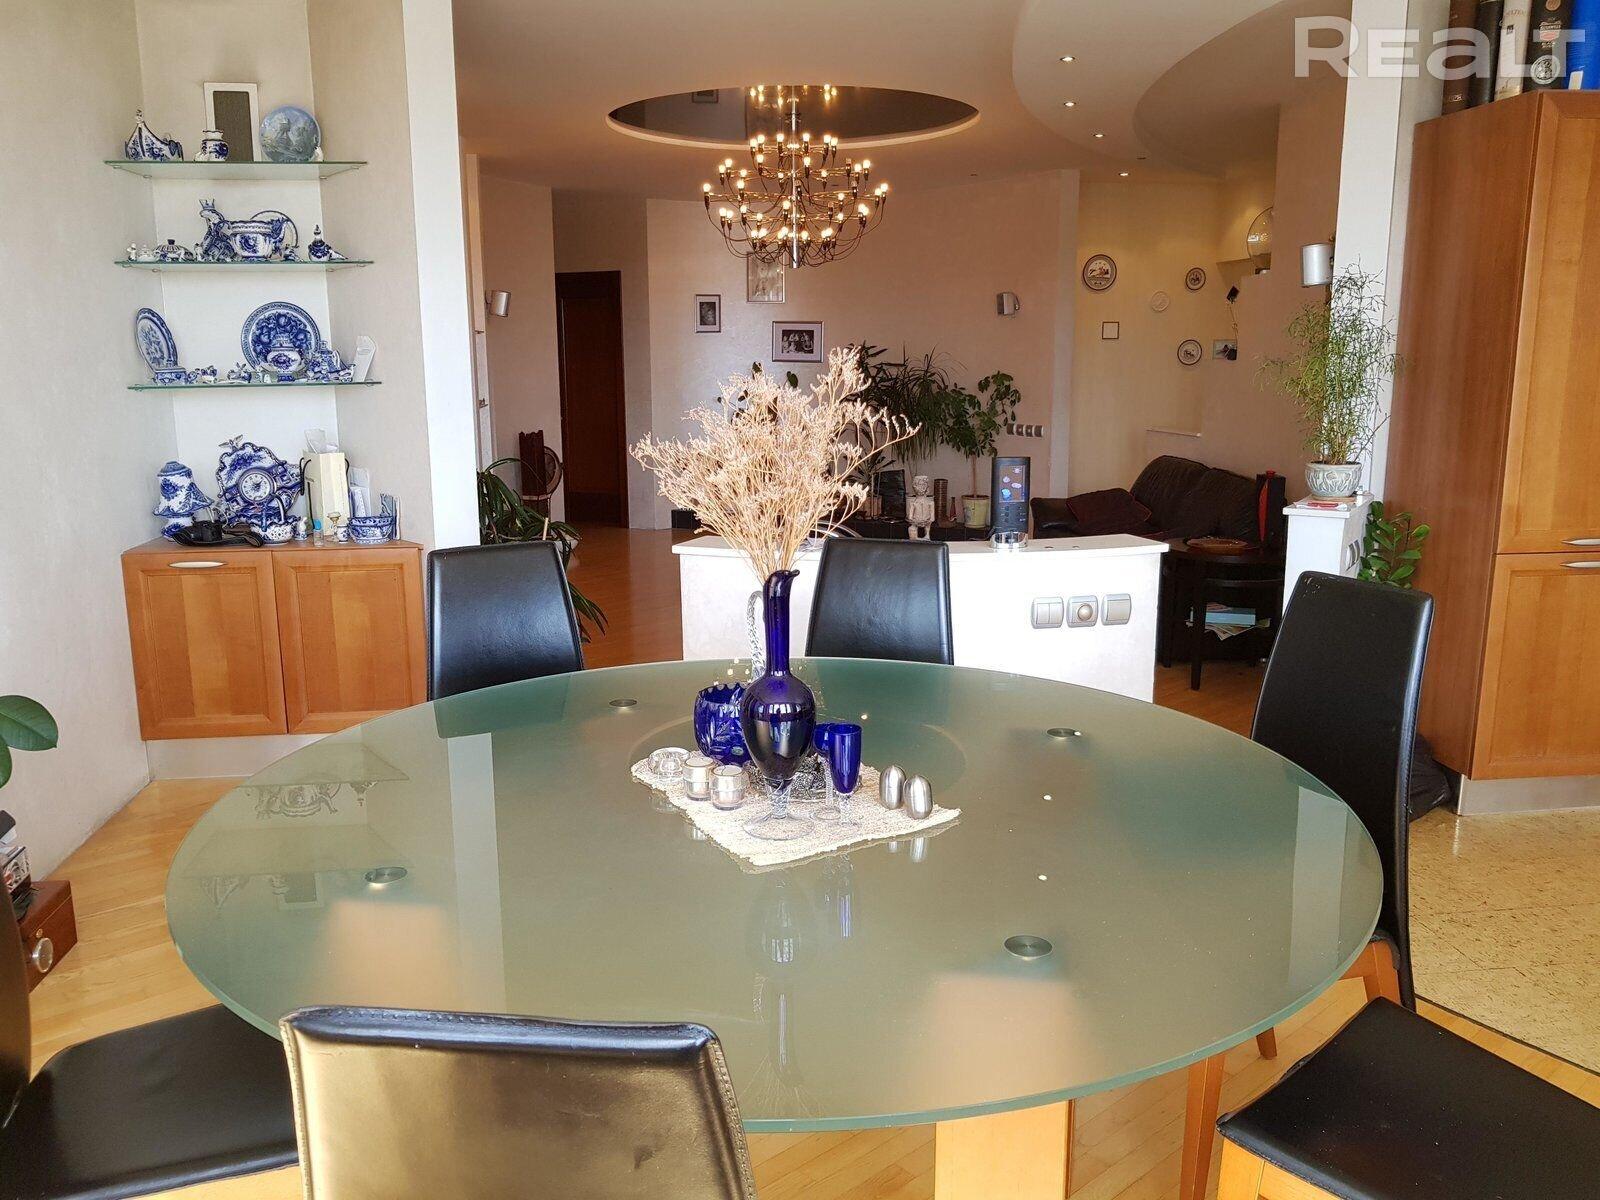 Продажа 4-х комнатной квартиры, г. Минск, ул. Гурского, дом 33 (р-н Михалово). Цена 412 451 руб